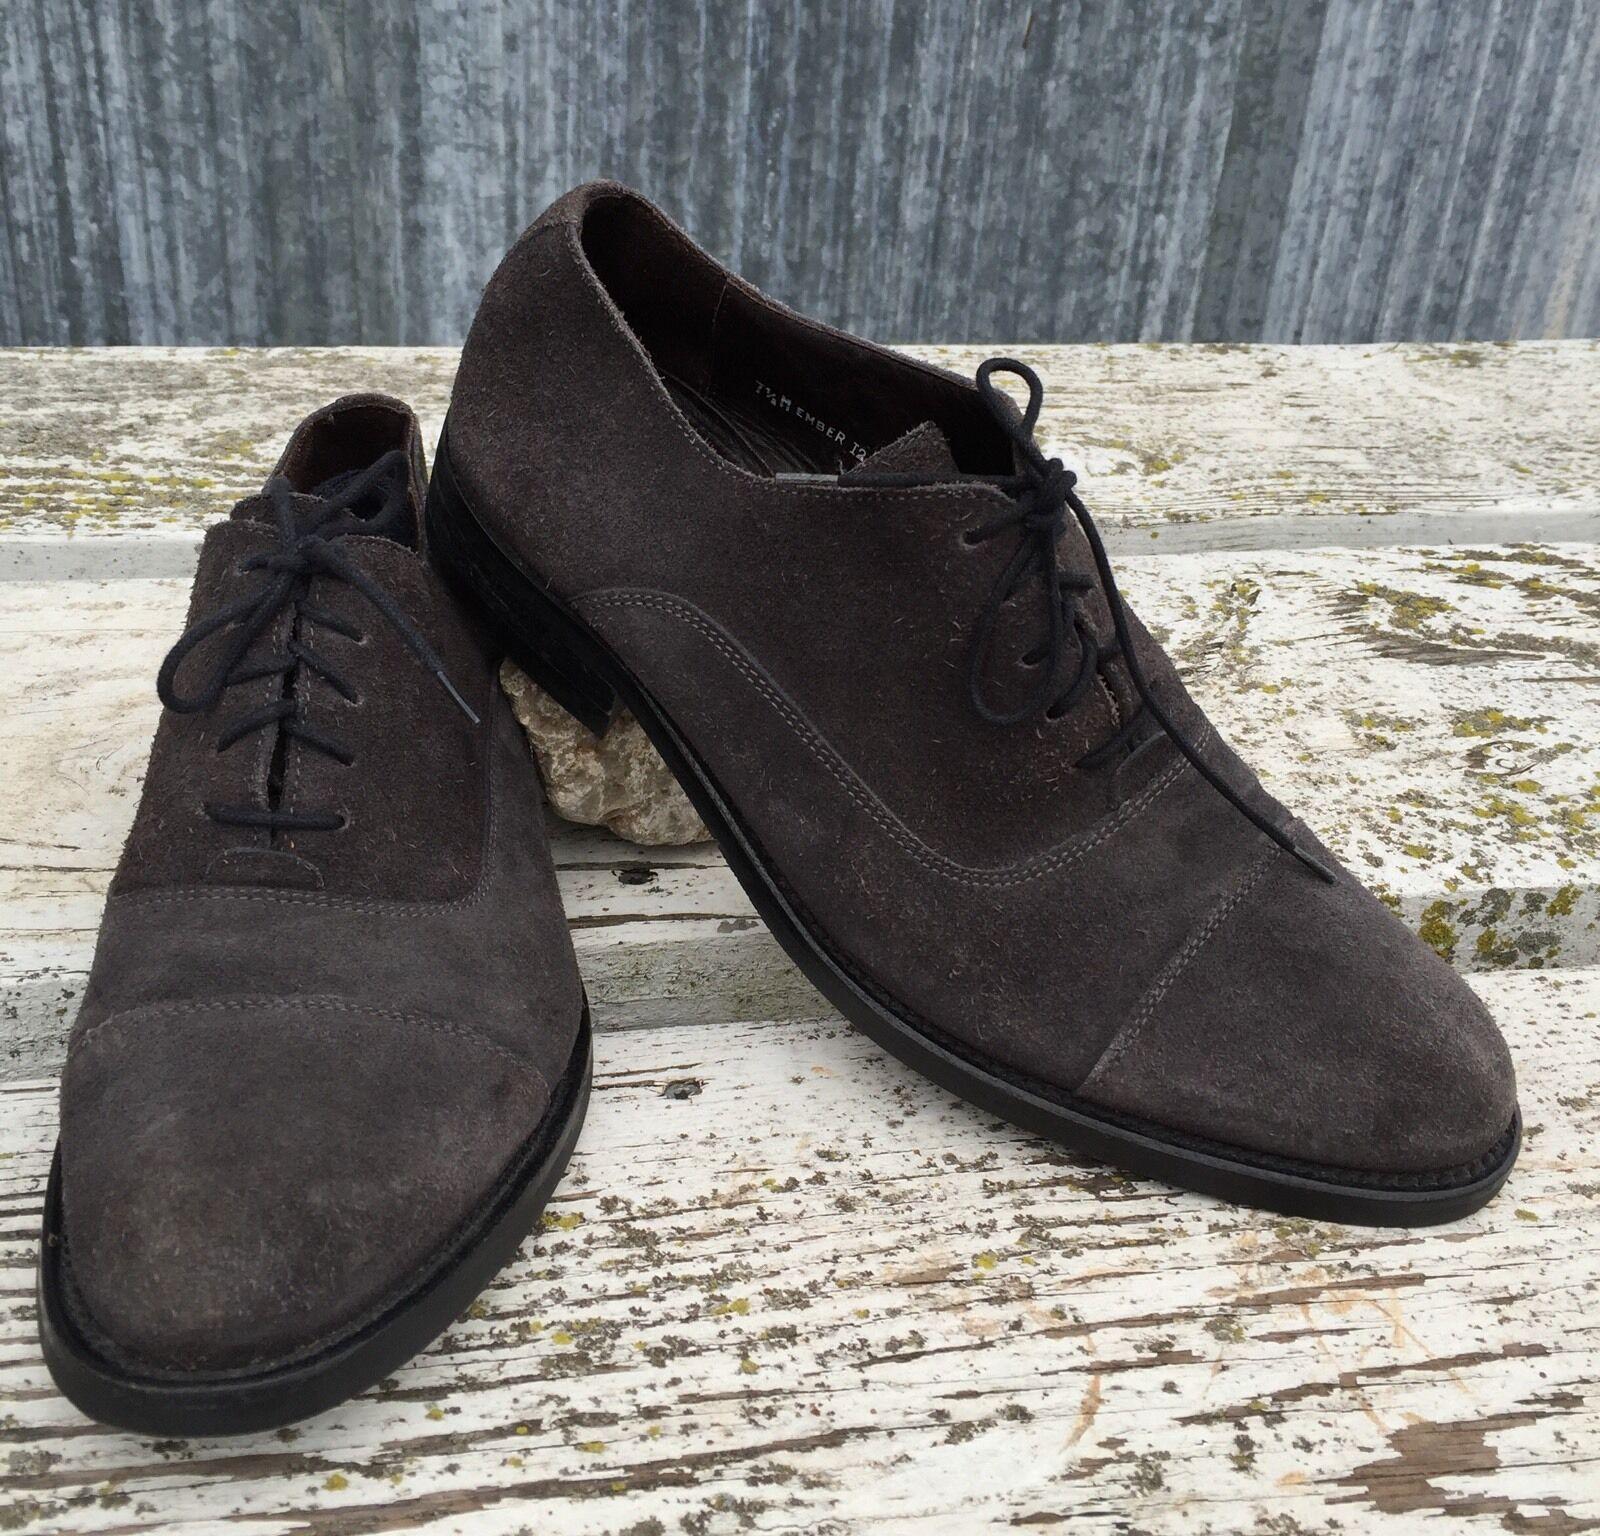 $269 Donald J Pliner Ember Cap Shoe Toe Suede Oxford Dress Shoe Cap Mens 7.5 M Italy Made 6b5a61